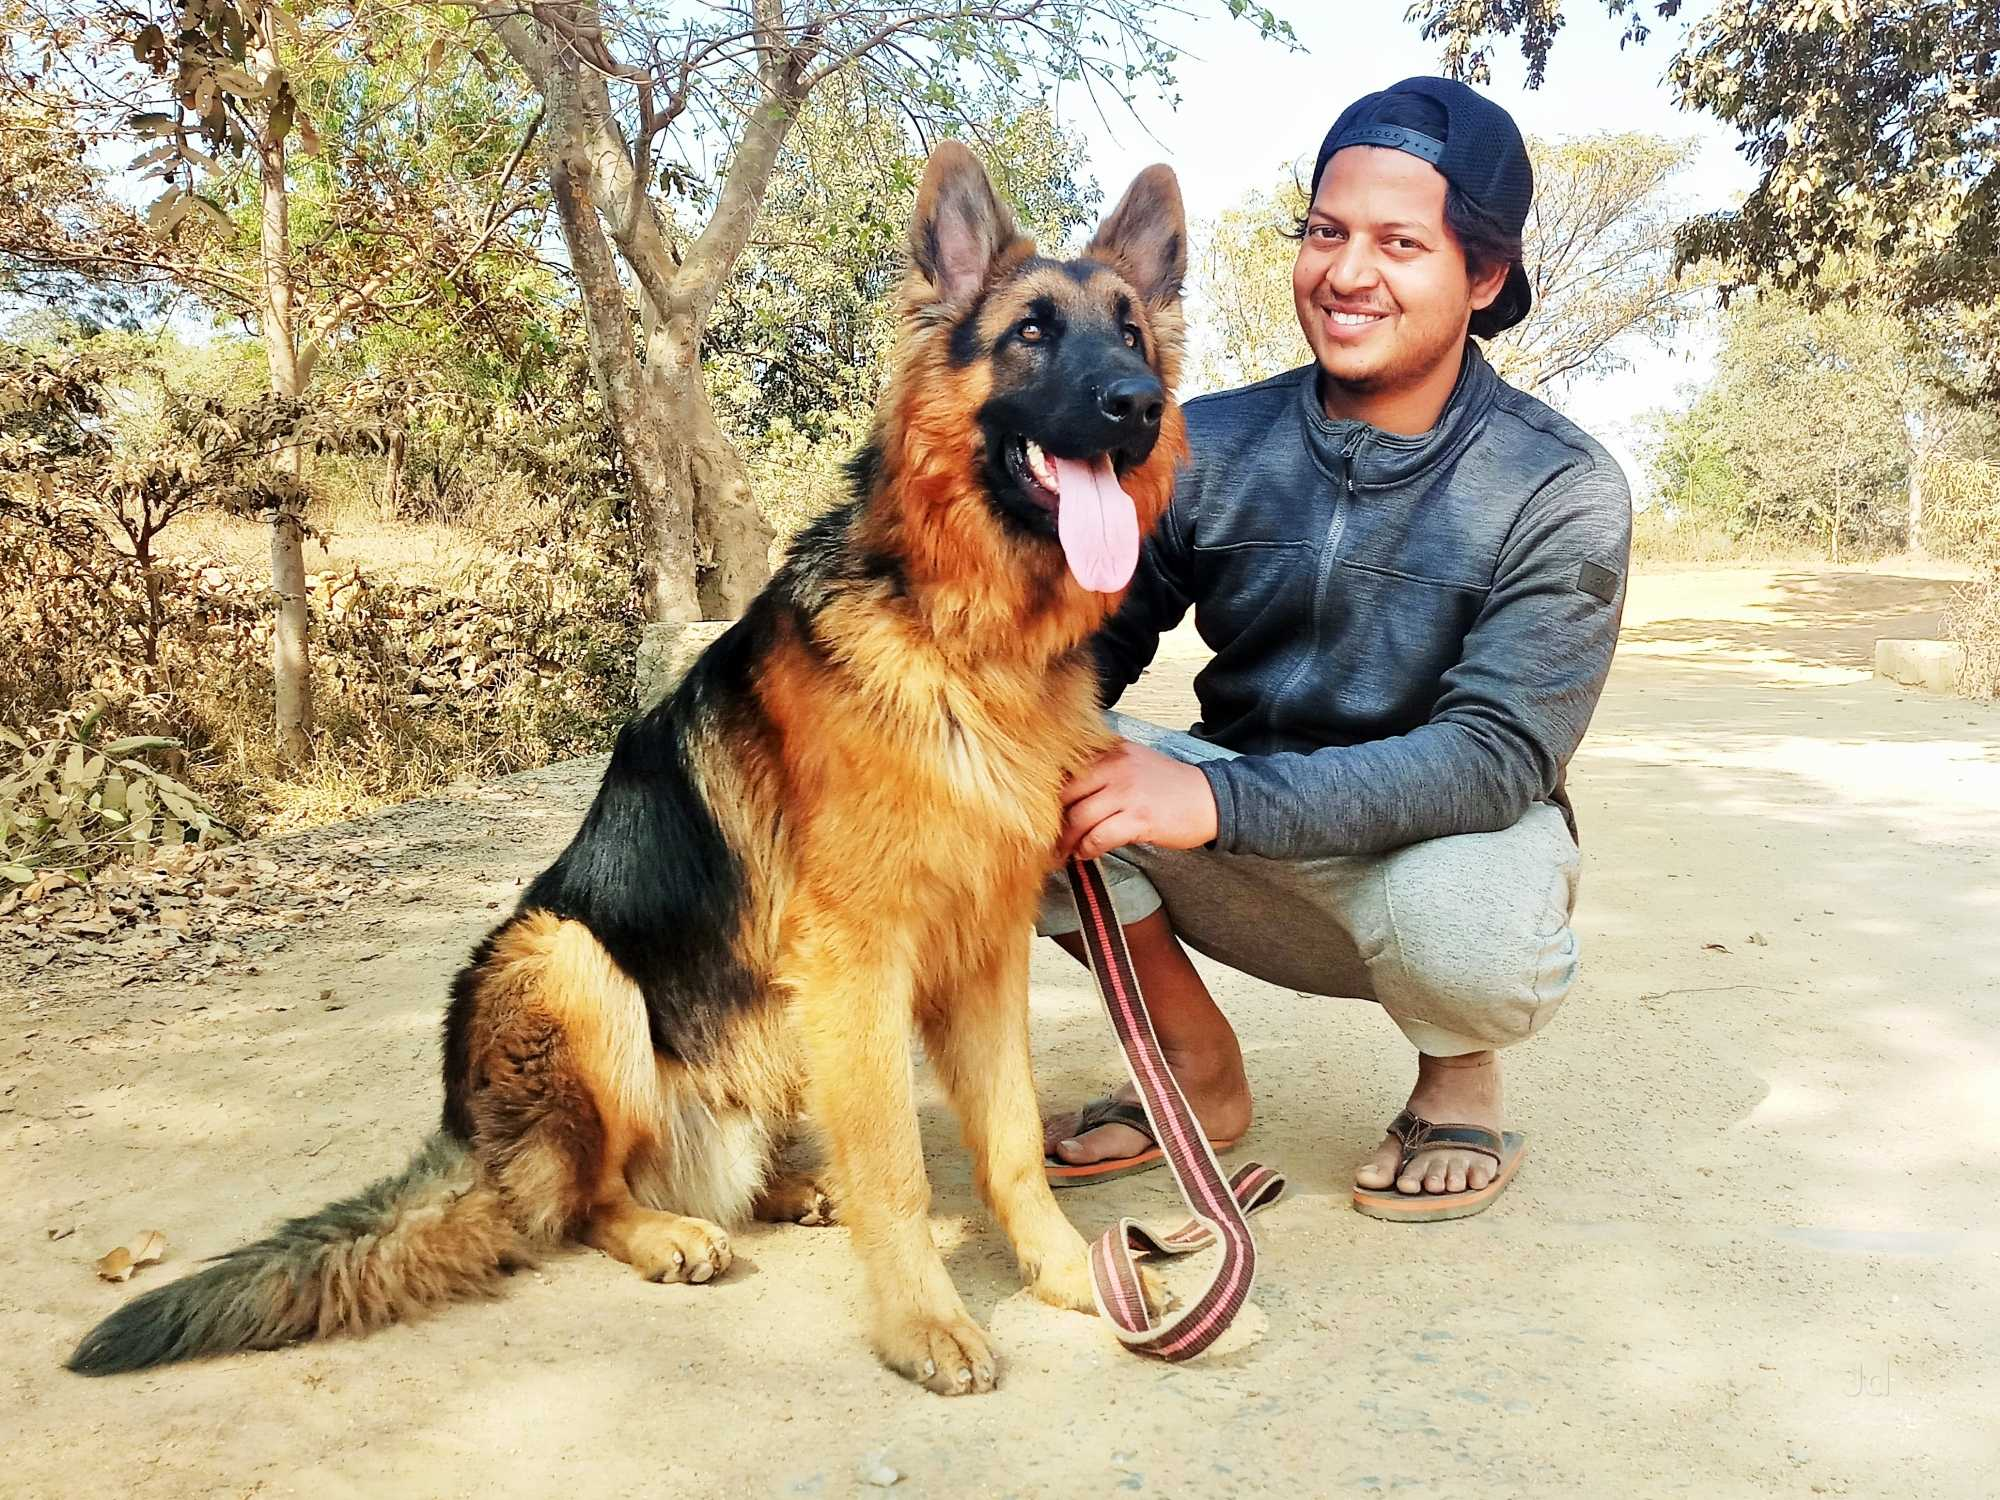 Top 3 Pet Shops For Golden Retriever In Kanke Road Best Pet Stores